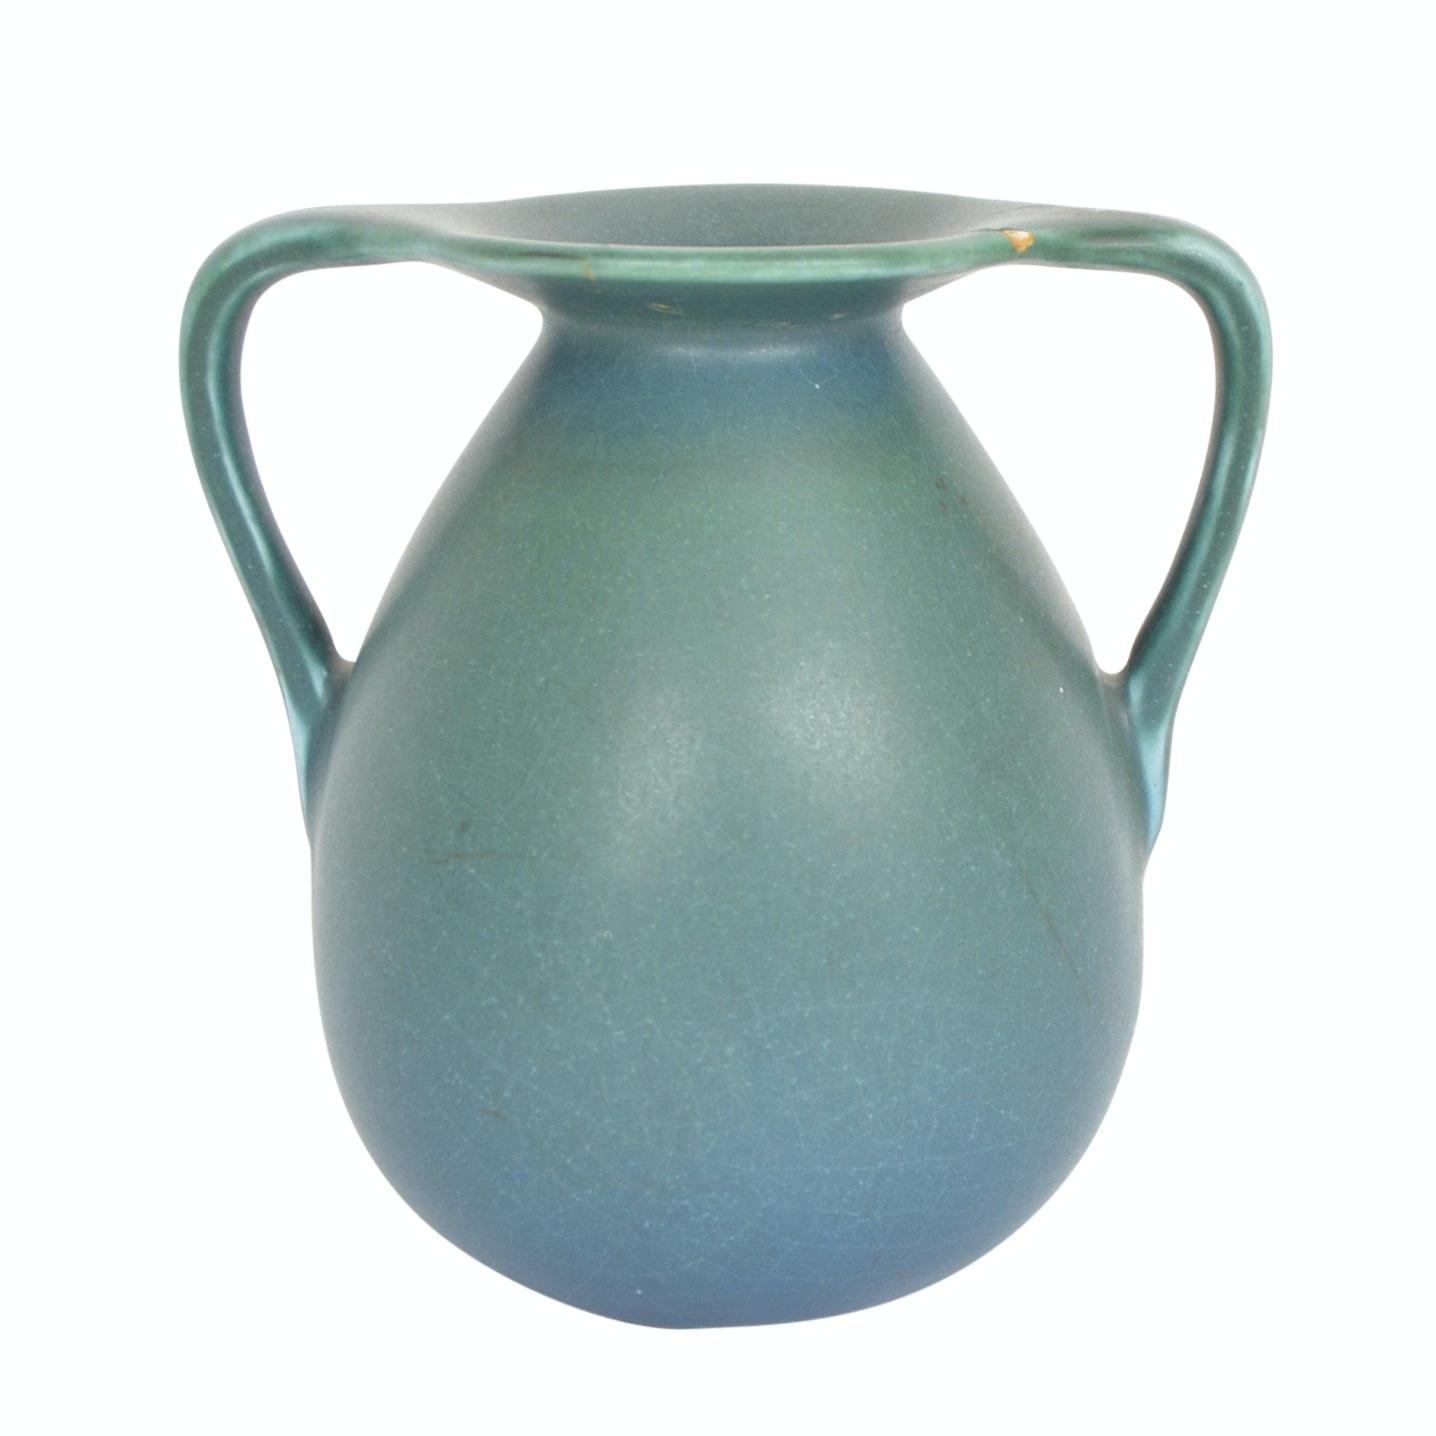 1917 Rookwood Pottery Vase